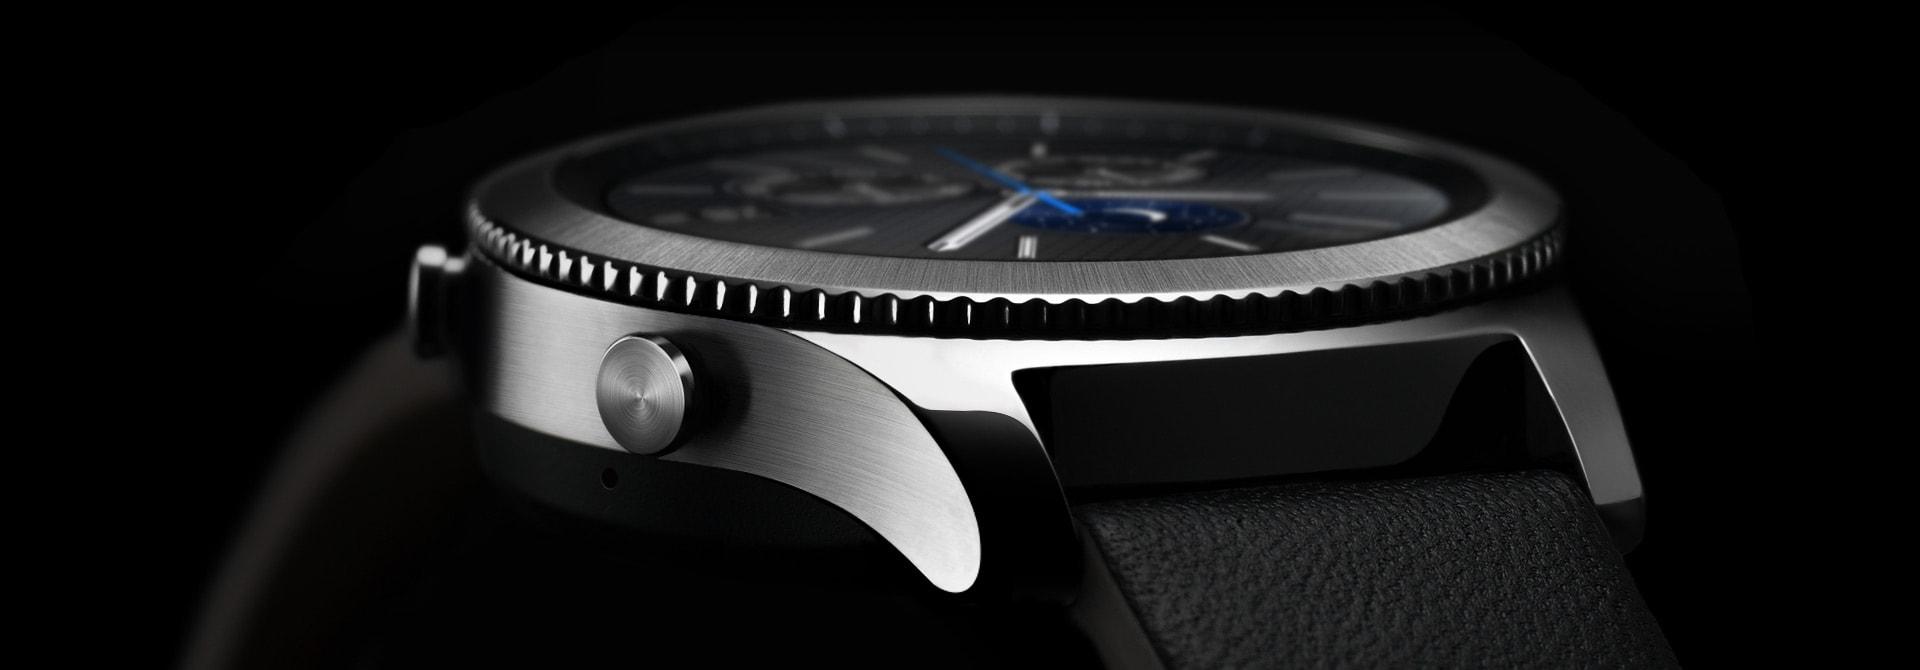 Смарт-годинник Samsung RM-770 Gear S3 Classic (SM-R770NZSA) купити ... 71cfe4b735277